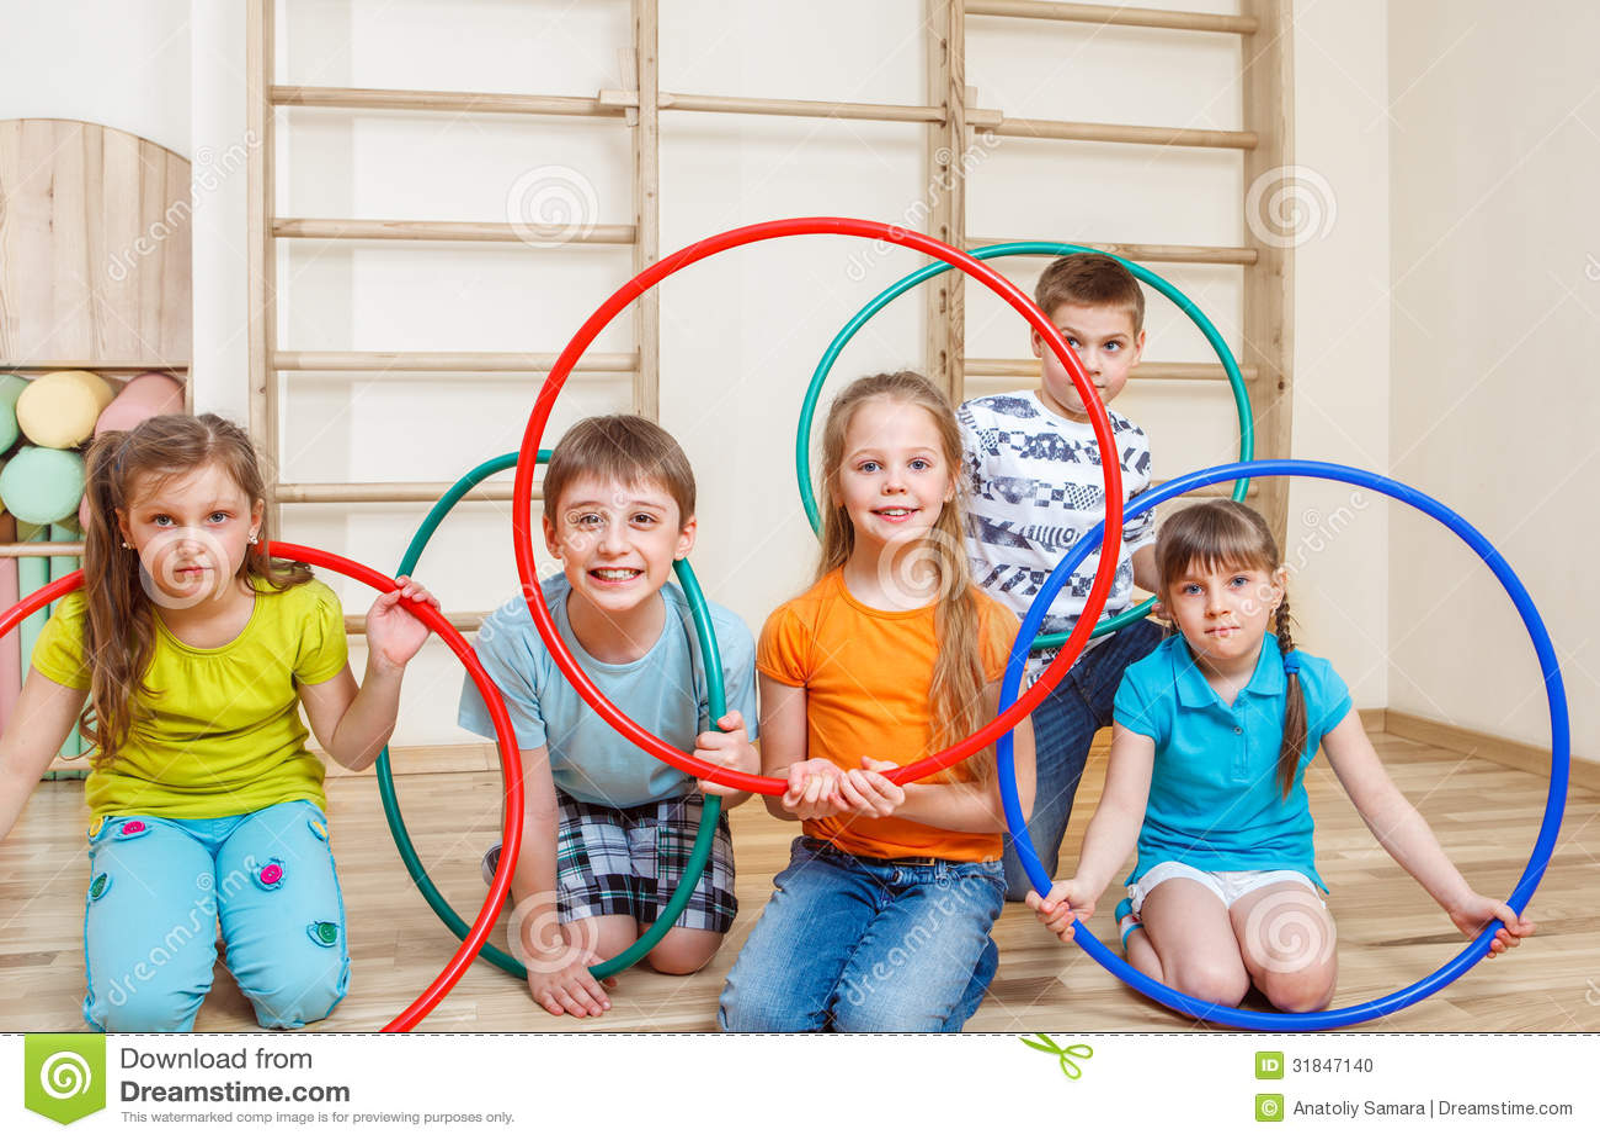 kids holding hula hoops stock photo image of beautiful. Black Bedroom Furniture Sets. Home Design Ideas